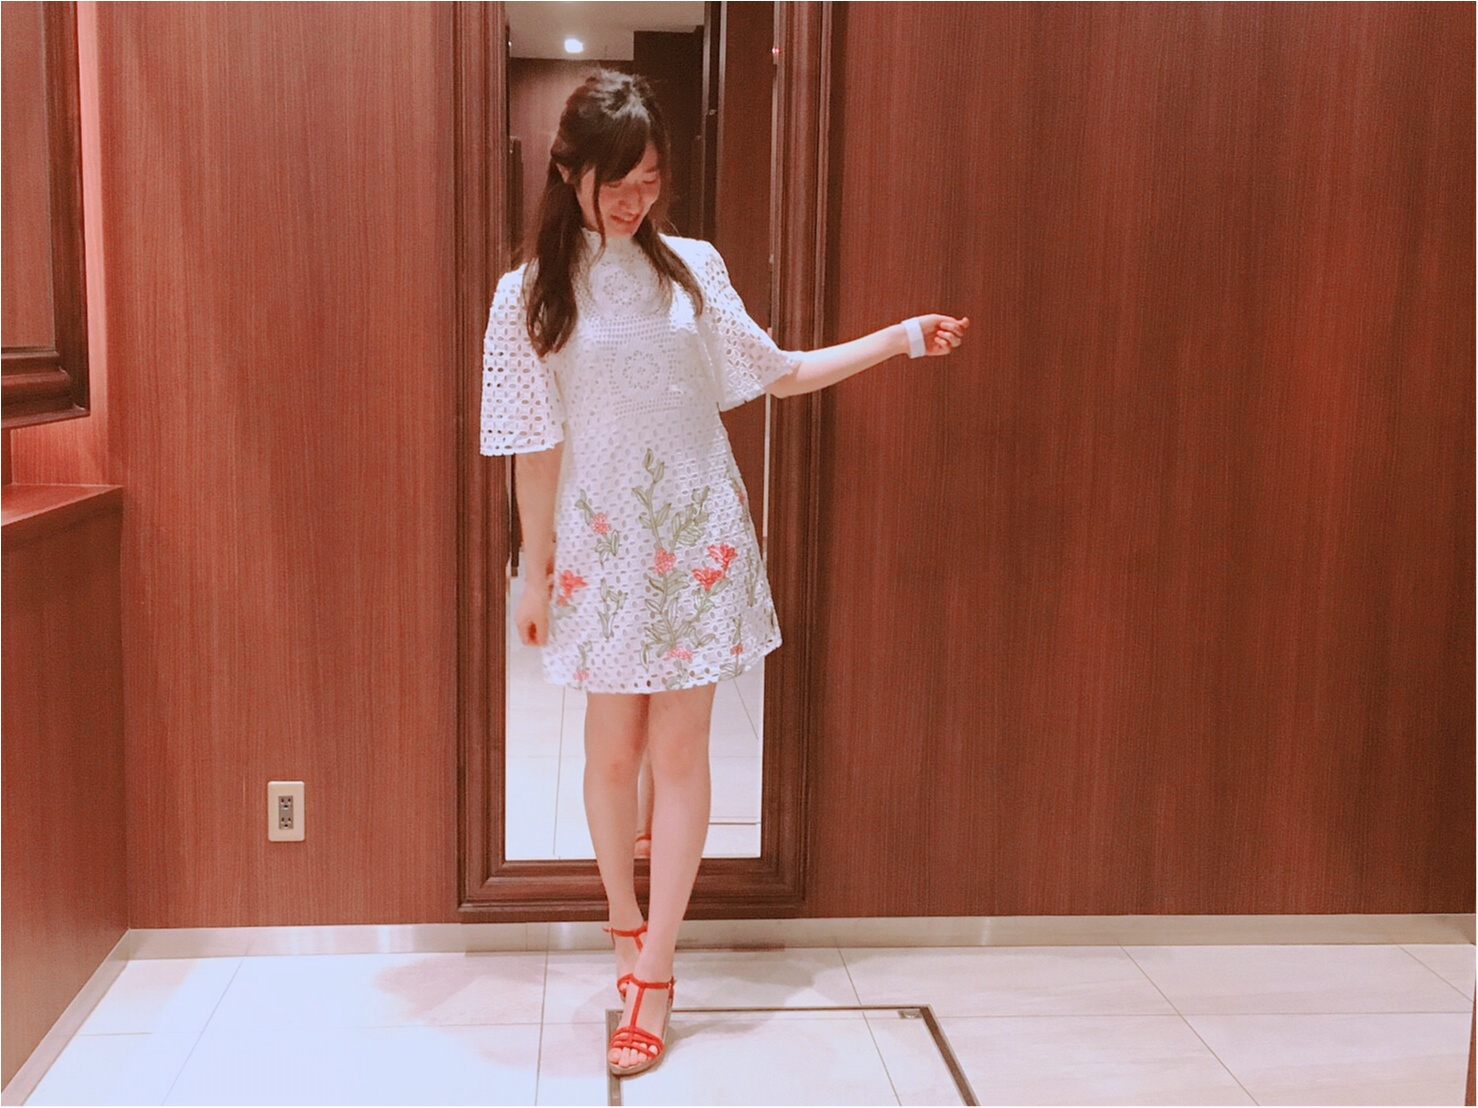 【ZARA】刺繍入りレースワンピース(¥7,990)がクラシカルで可愛い♡_4